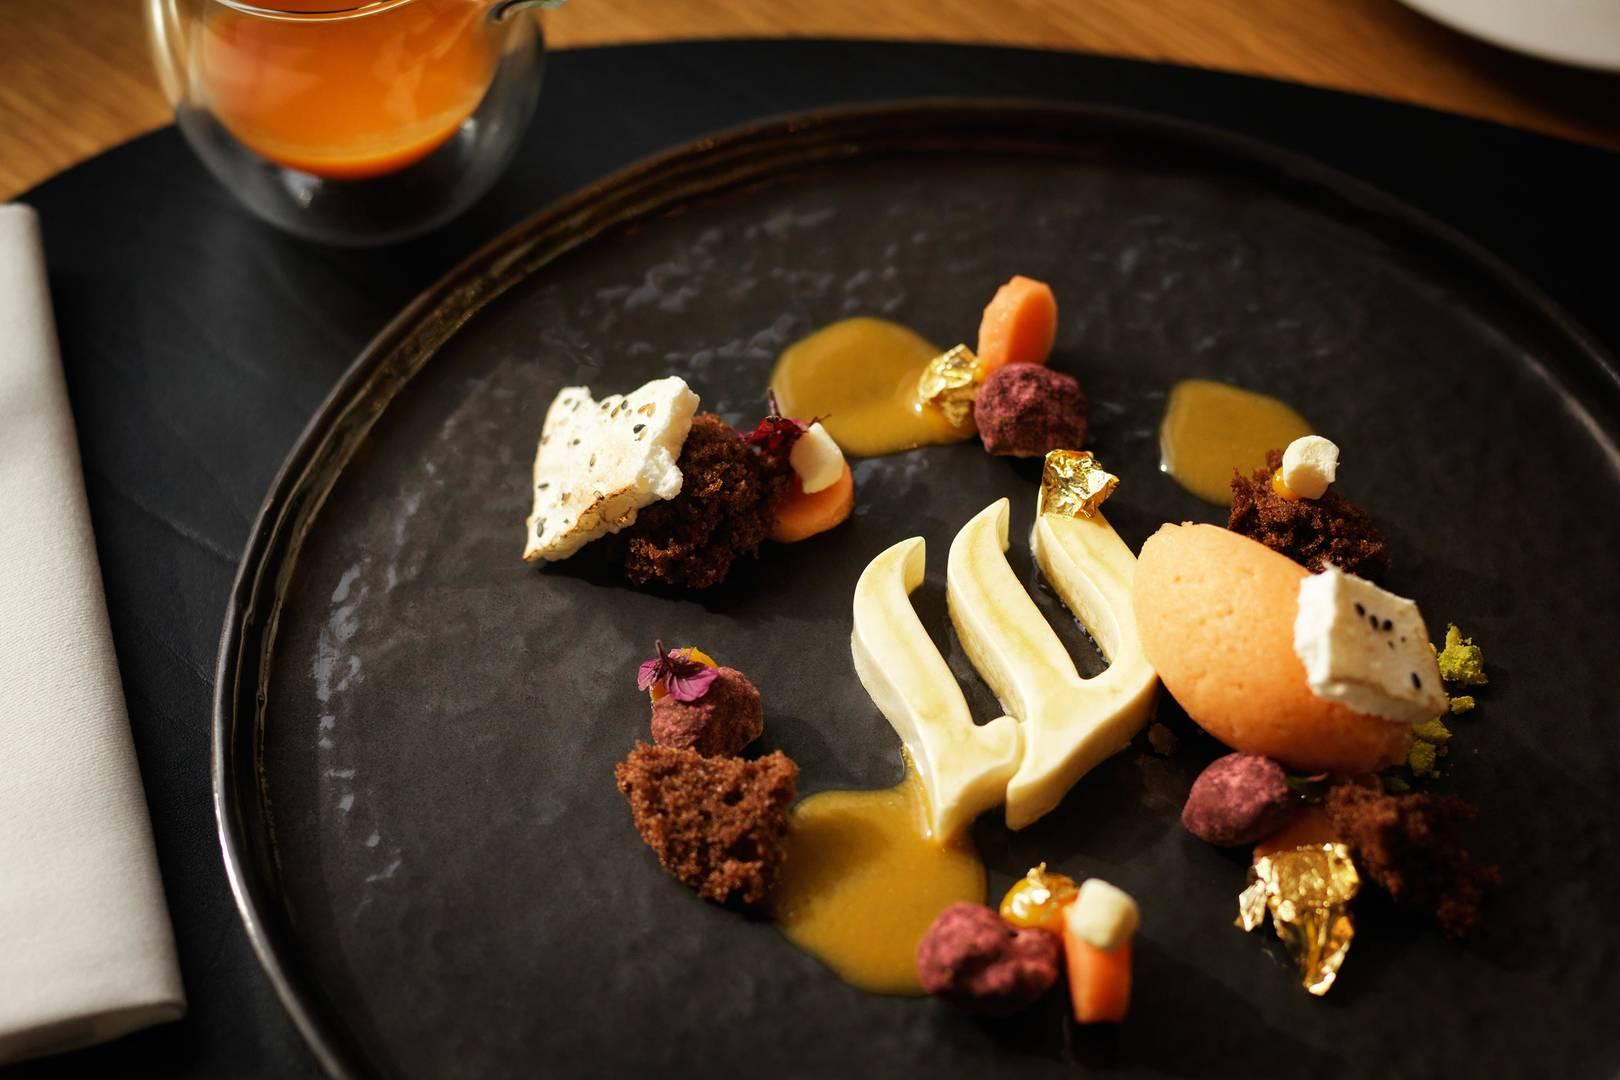 https://cdn.jumeirah.com/-/mediadh/DH/Hospitality/Jumeirah/Restaurants/Frankfurt/Frankfurt-Max-On-One-Grill-Room/Restaurant-Gallery/Jumeirah-Frankfurt-Food-Shots-Dessert-2_6-4.jpg?h=1080&w=1620&hash=A26DAFB1D2BA5B9AFB35B15588C94D23